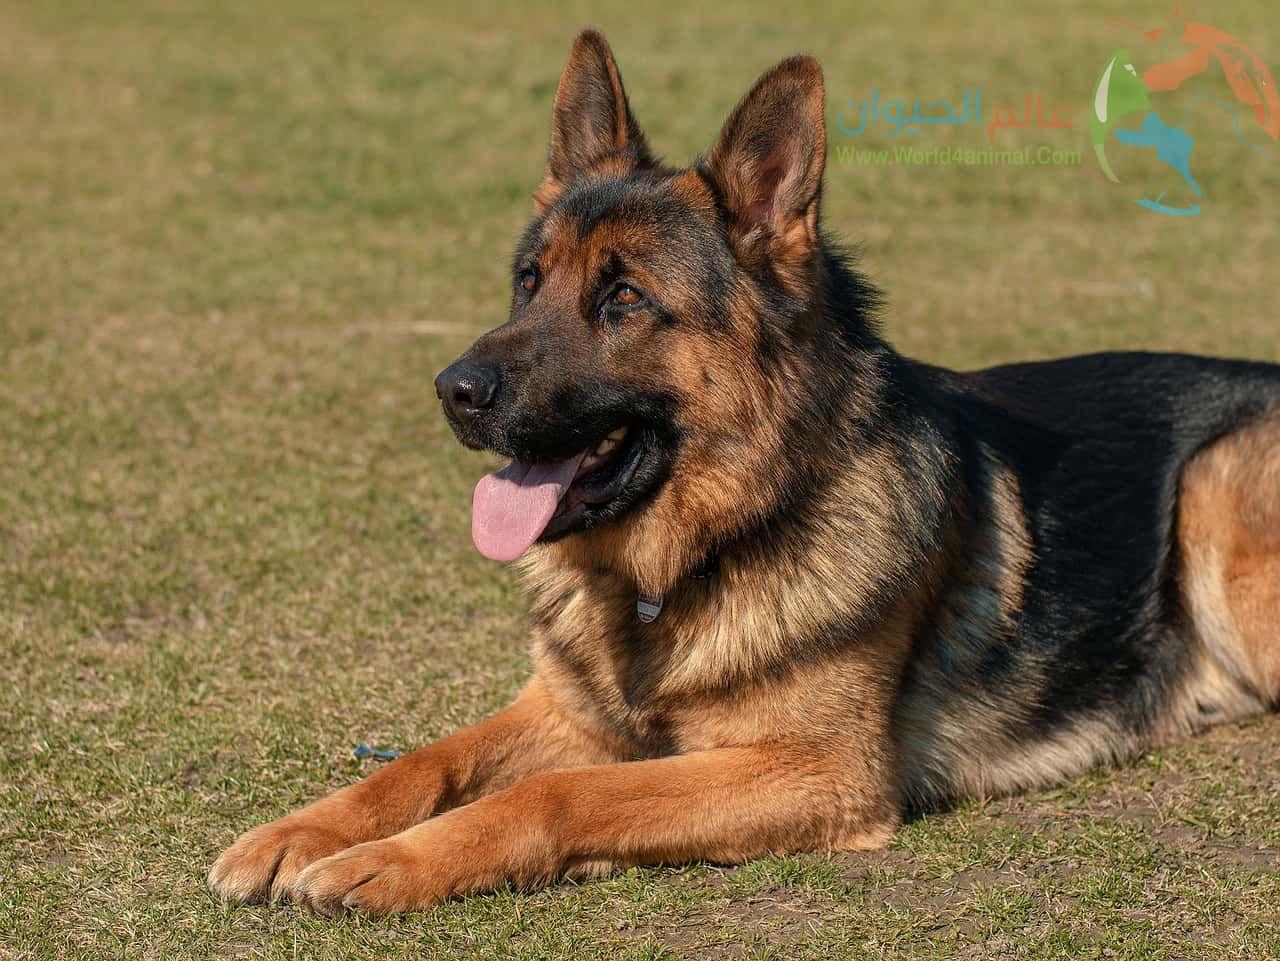 معلومات عن كلاب جيرمن شيبرد وجيرمن شيبرد لونج هير Guard Dogs Best Guard Dogs German Shepherd Breeders